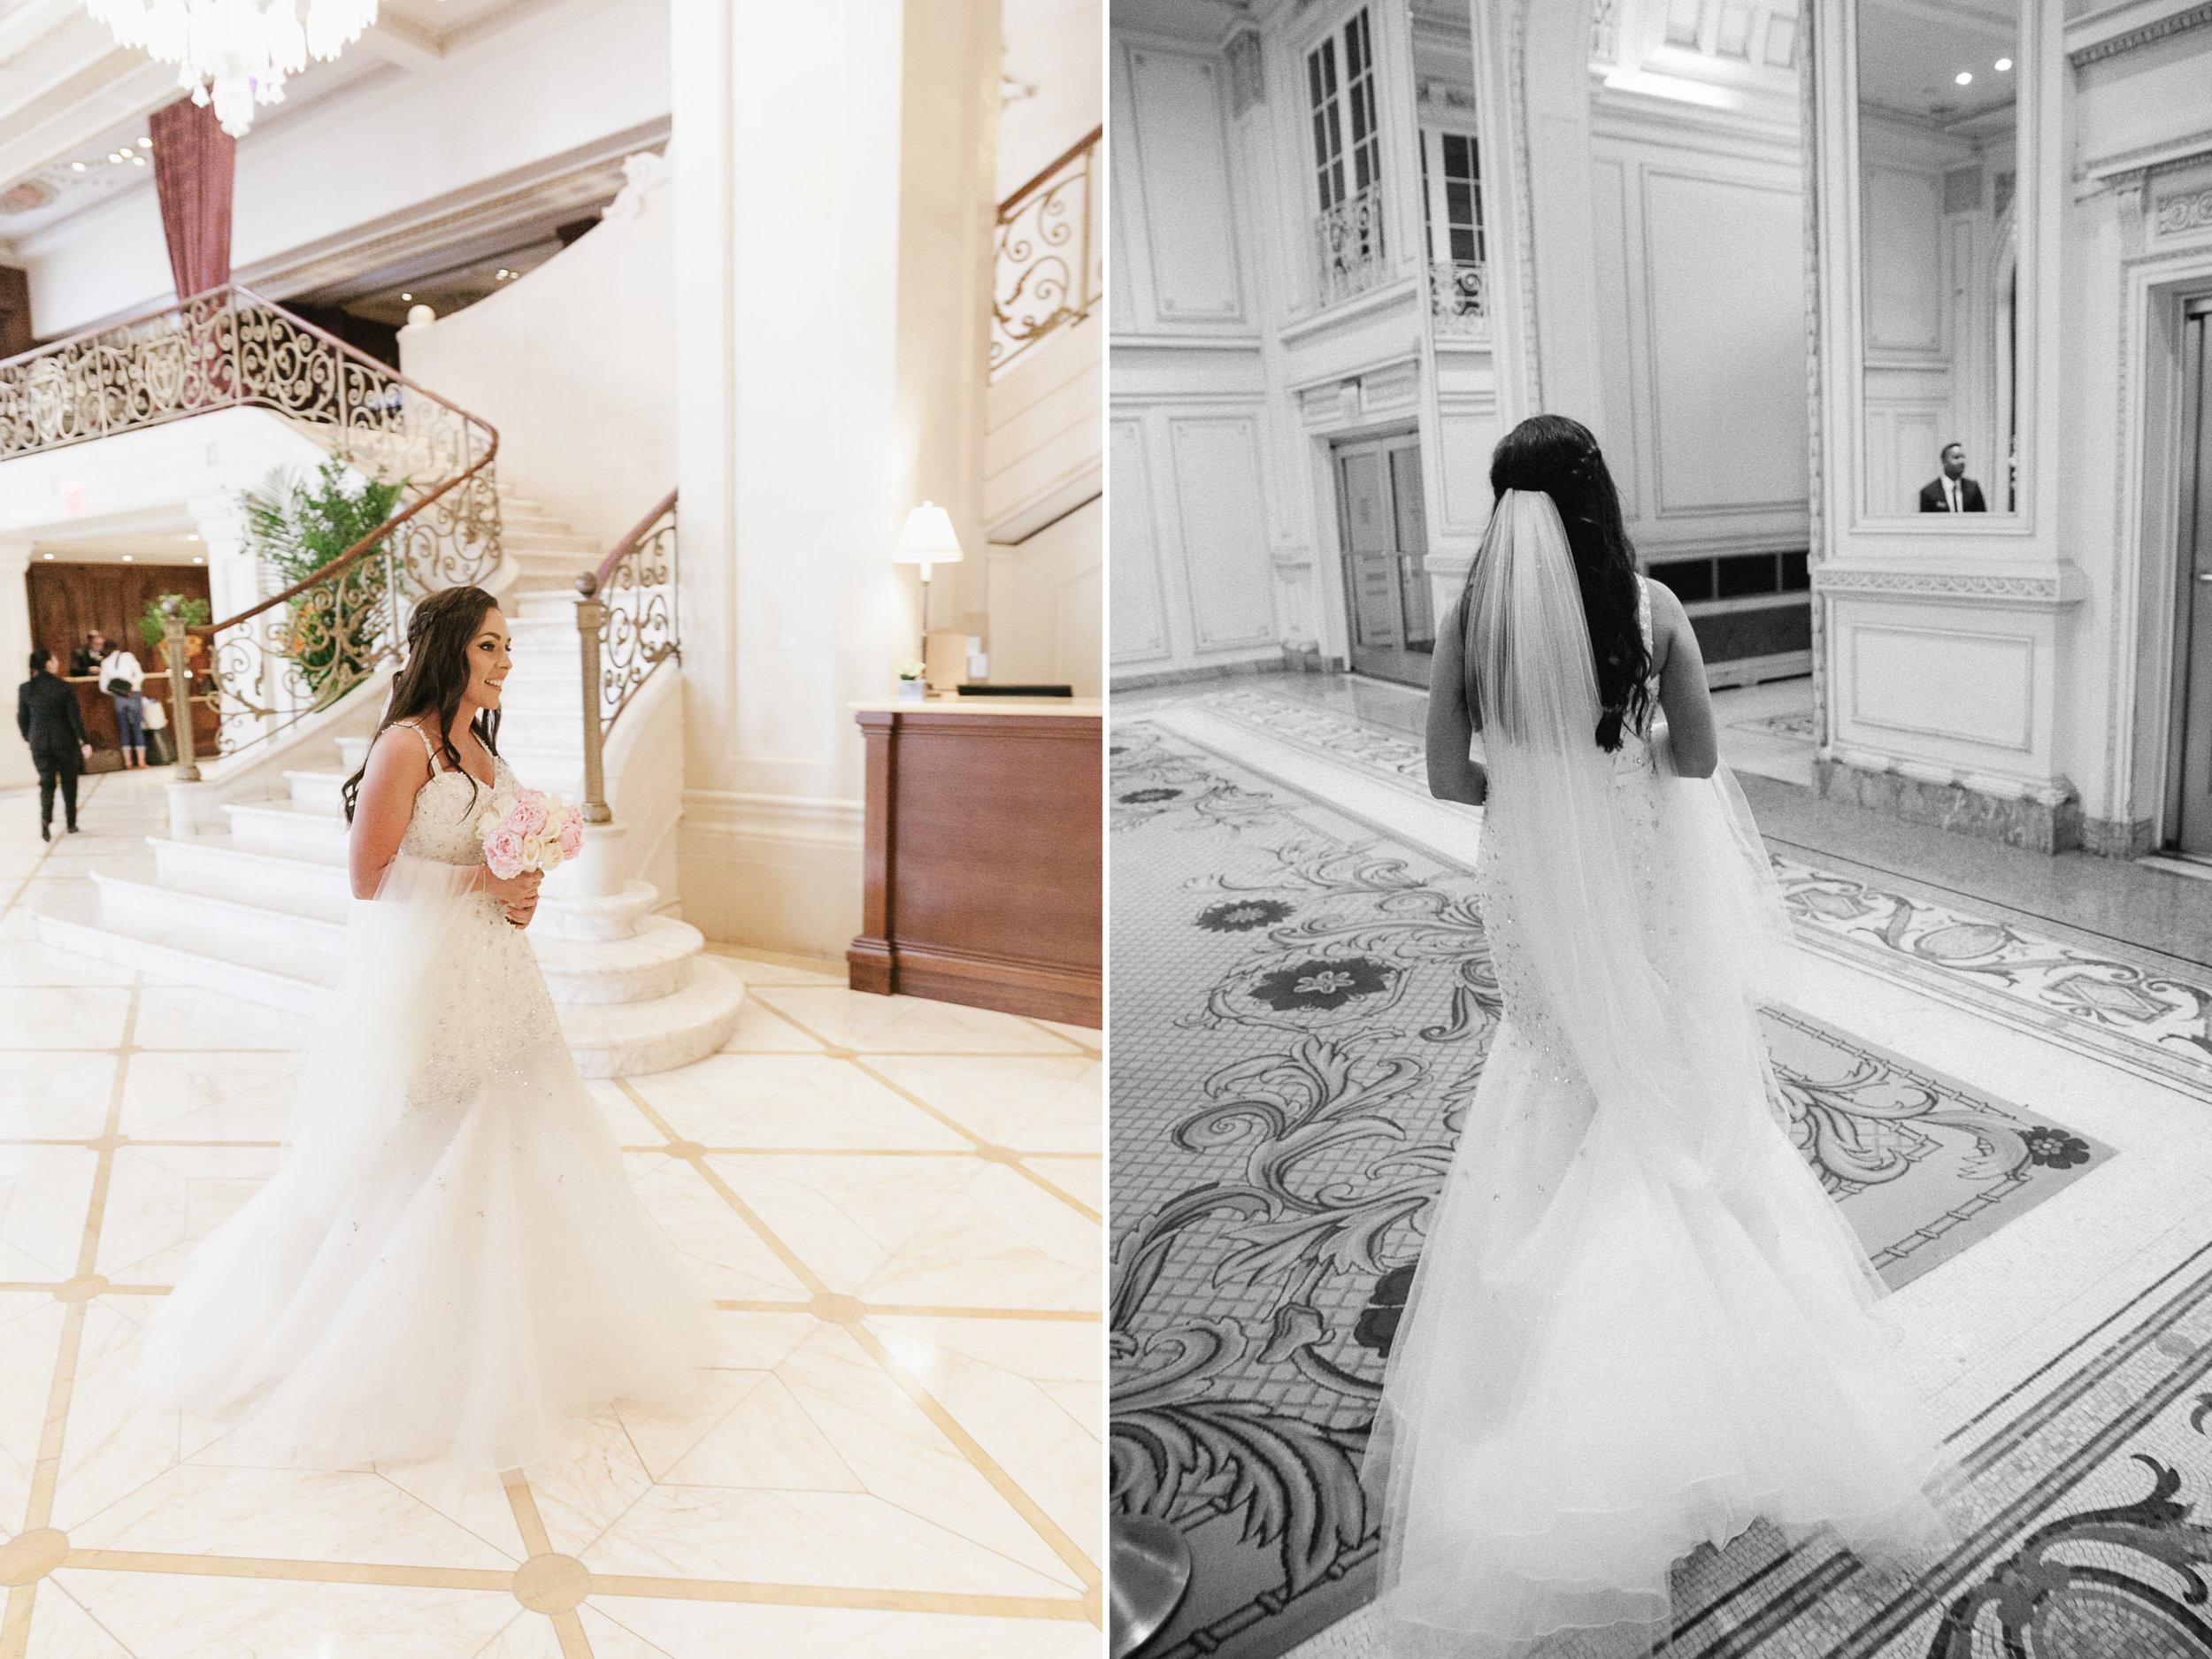 Plaza-hotel-central-park-wedding-A&M-15.jpg